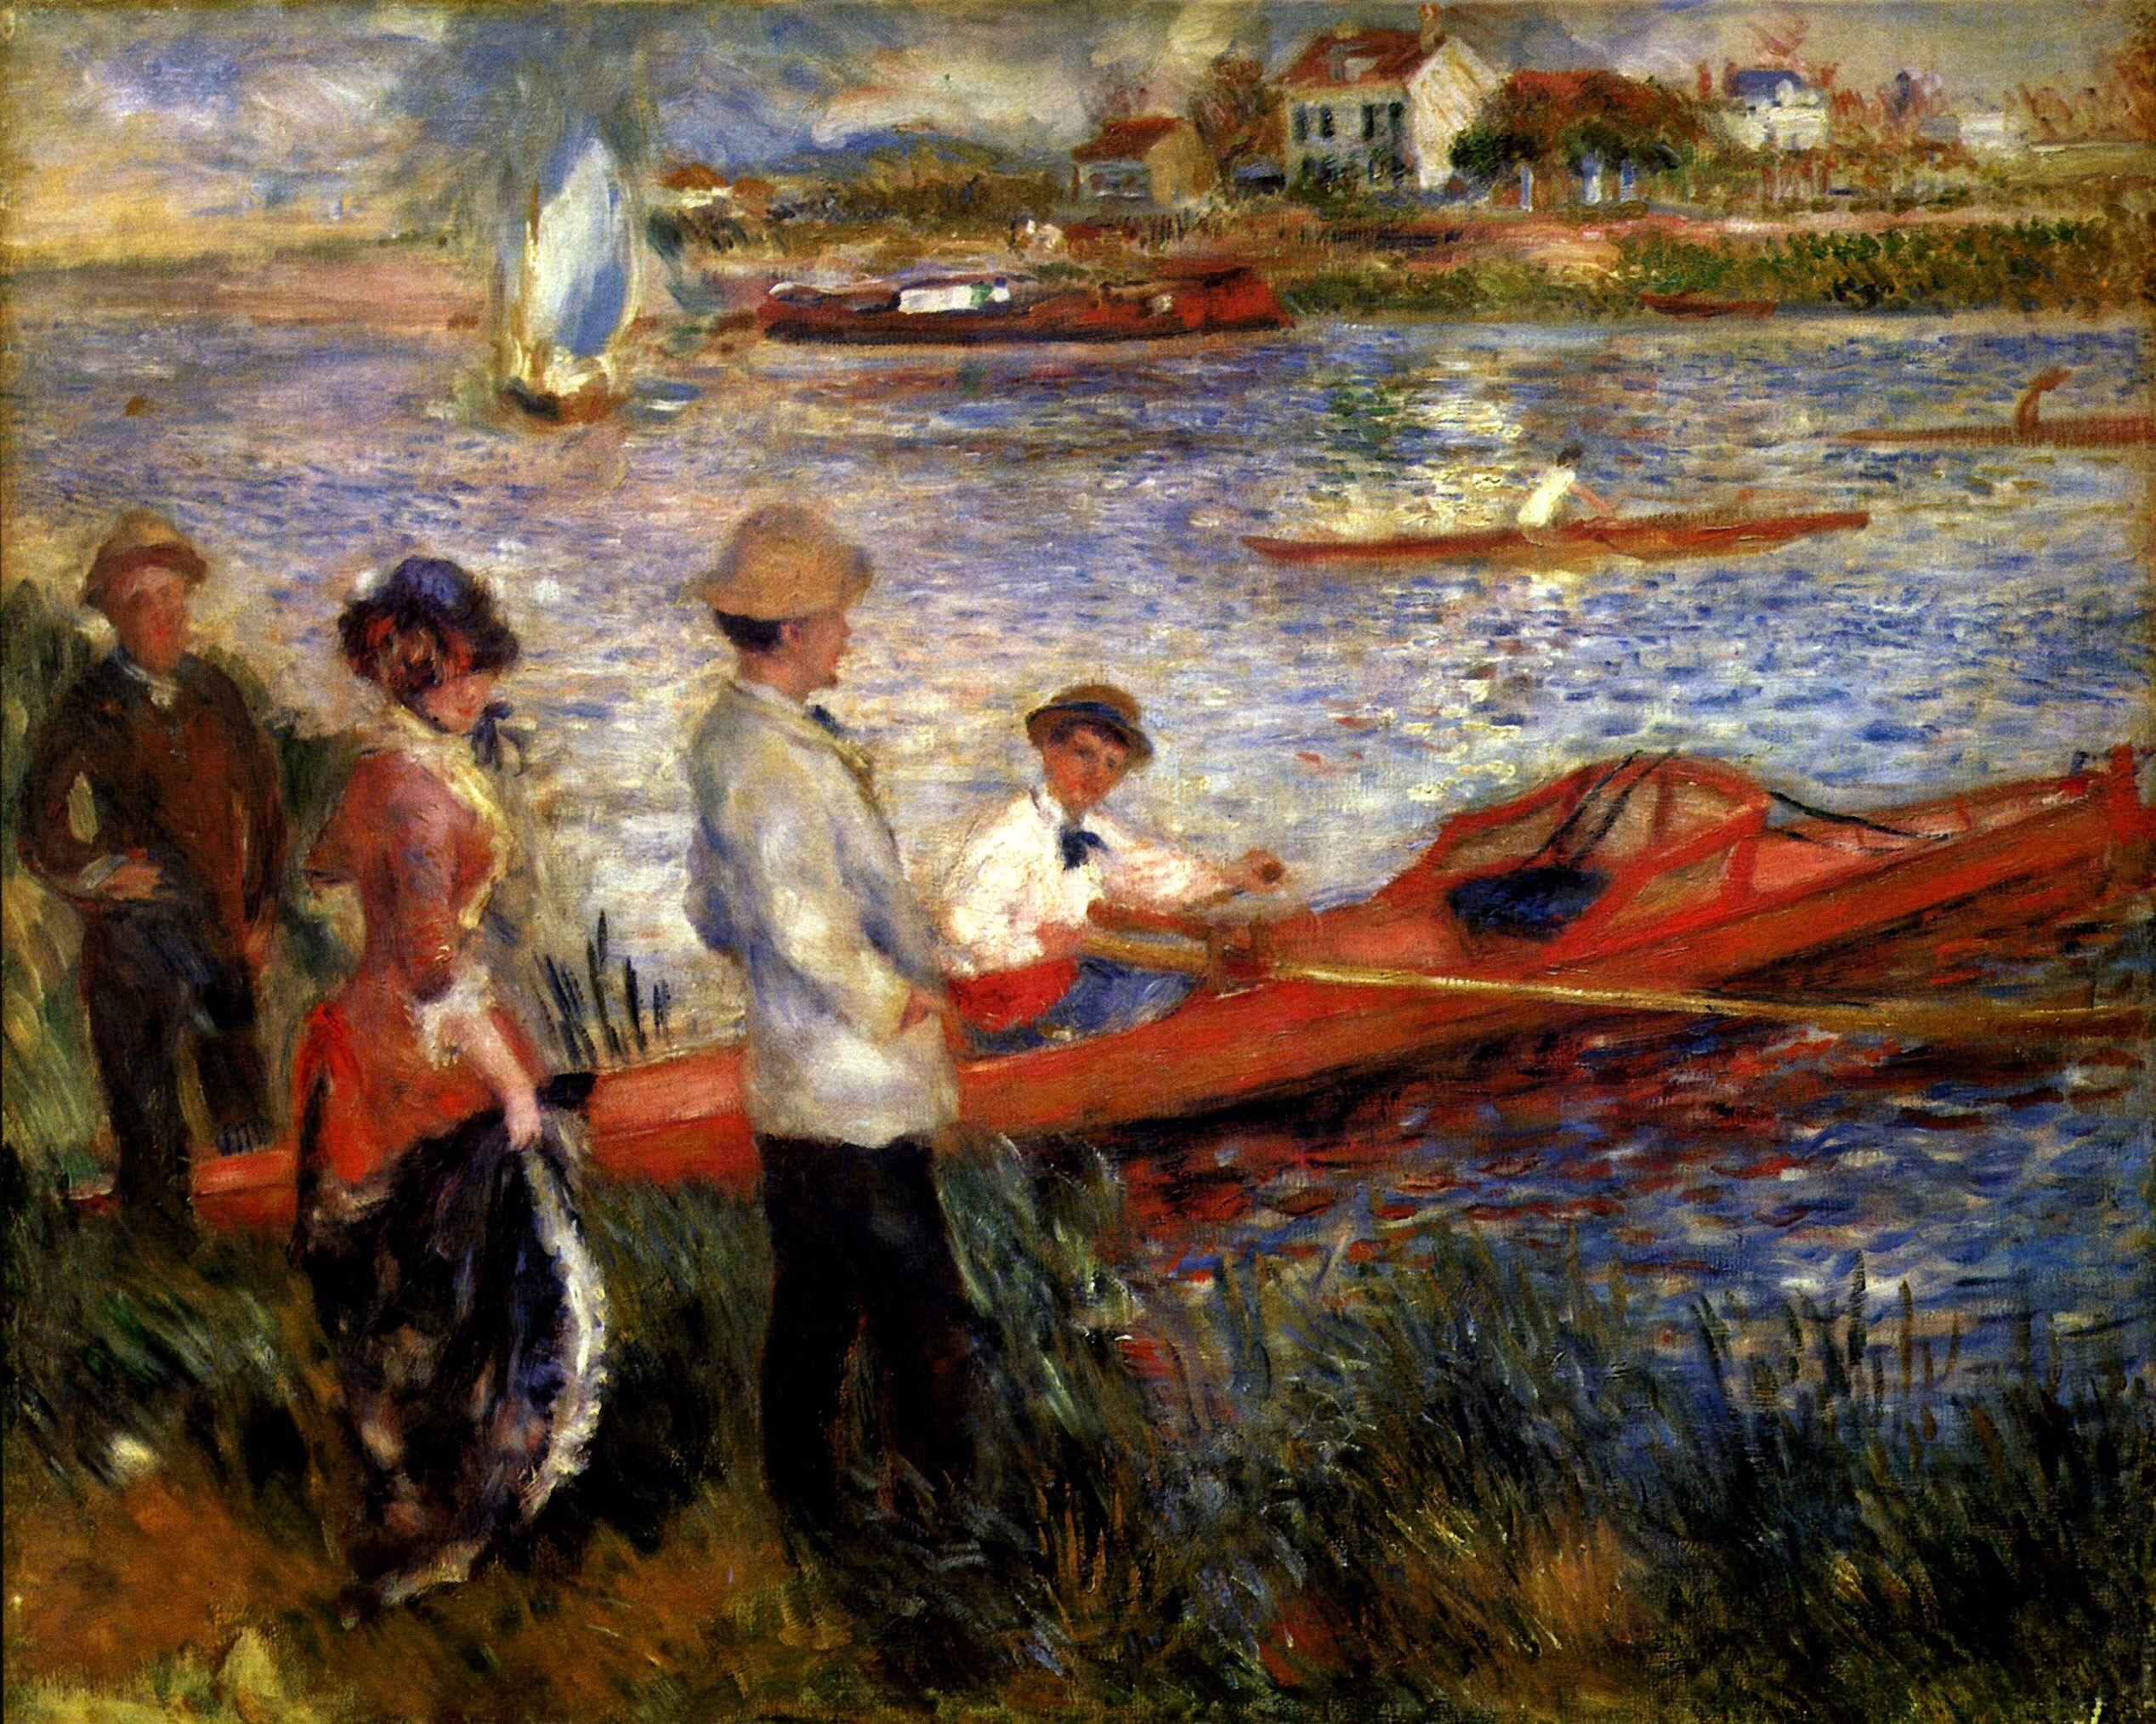 """Oarsman off Chateau"", by Renoir, 1841-1919"